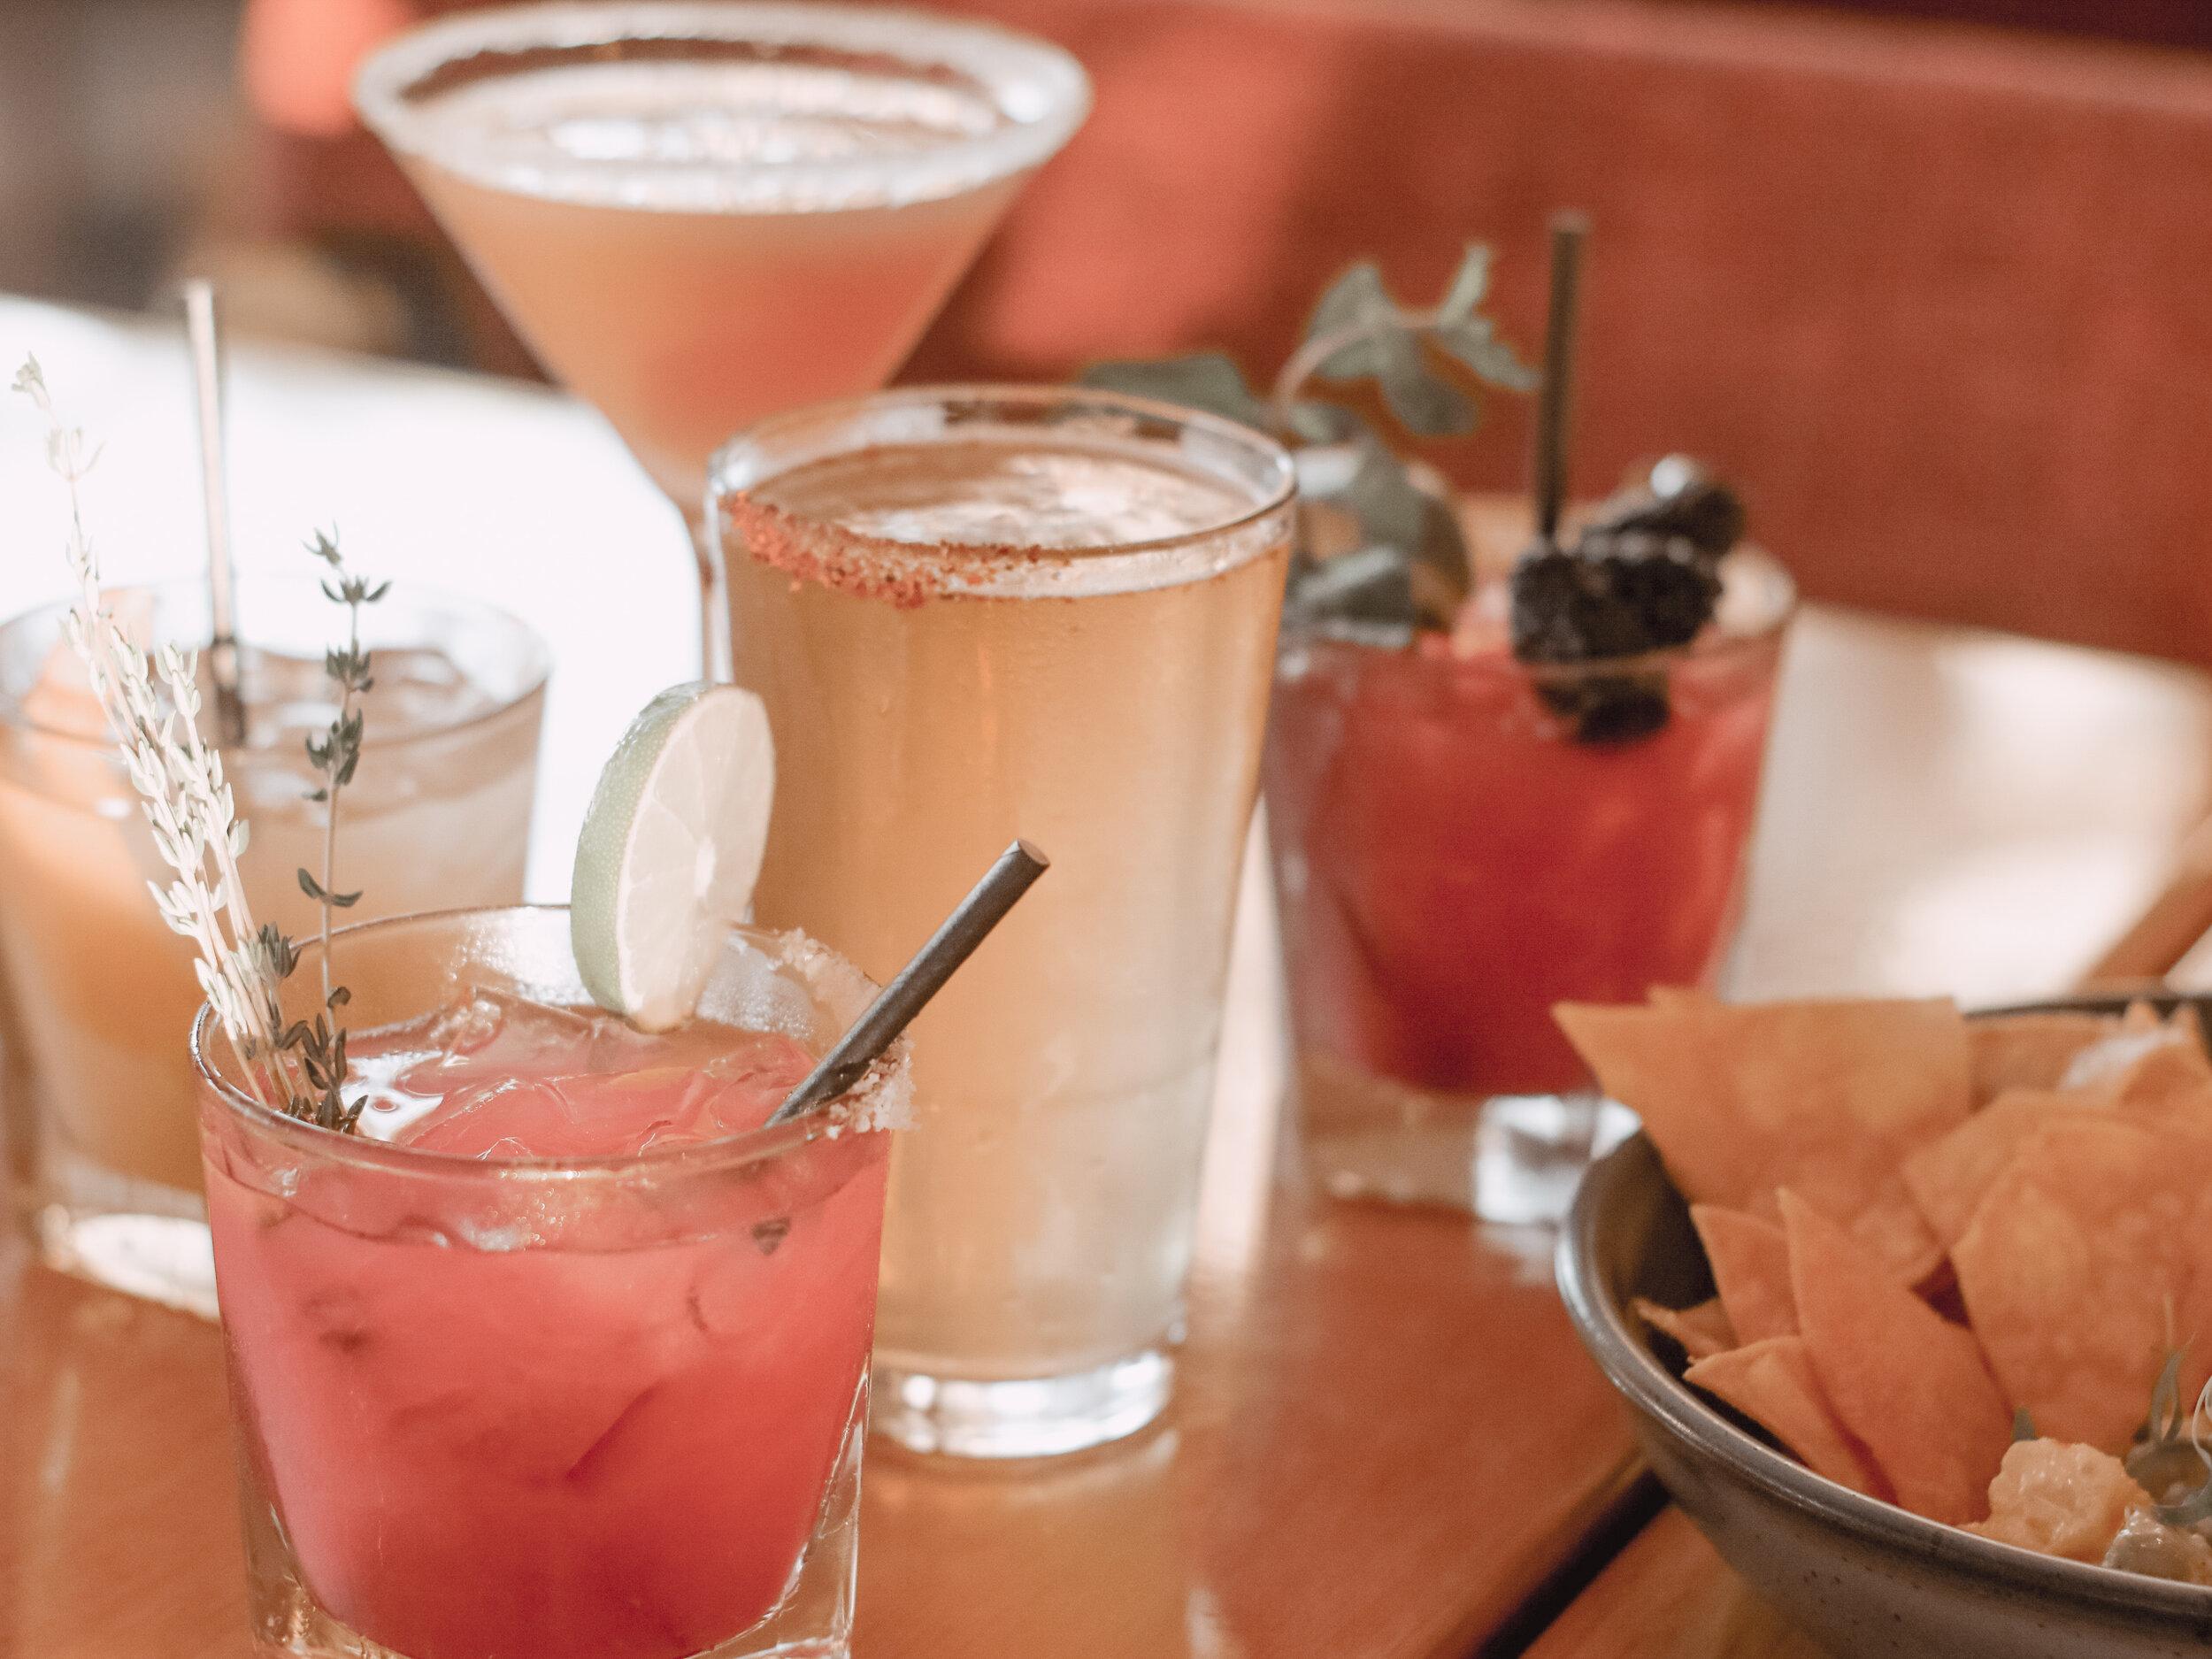 Eats Kitchen & Bar Cocktails and Beer | AMANDANHAMMOND.COM